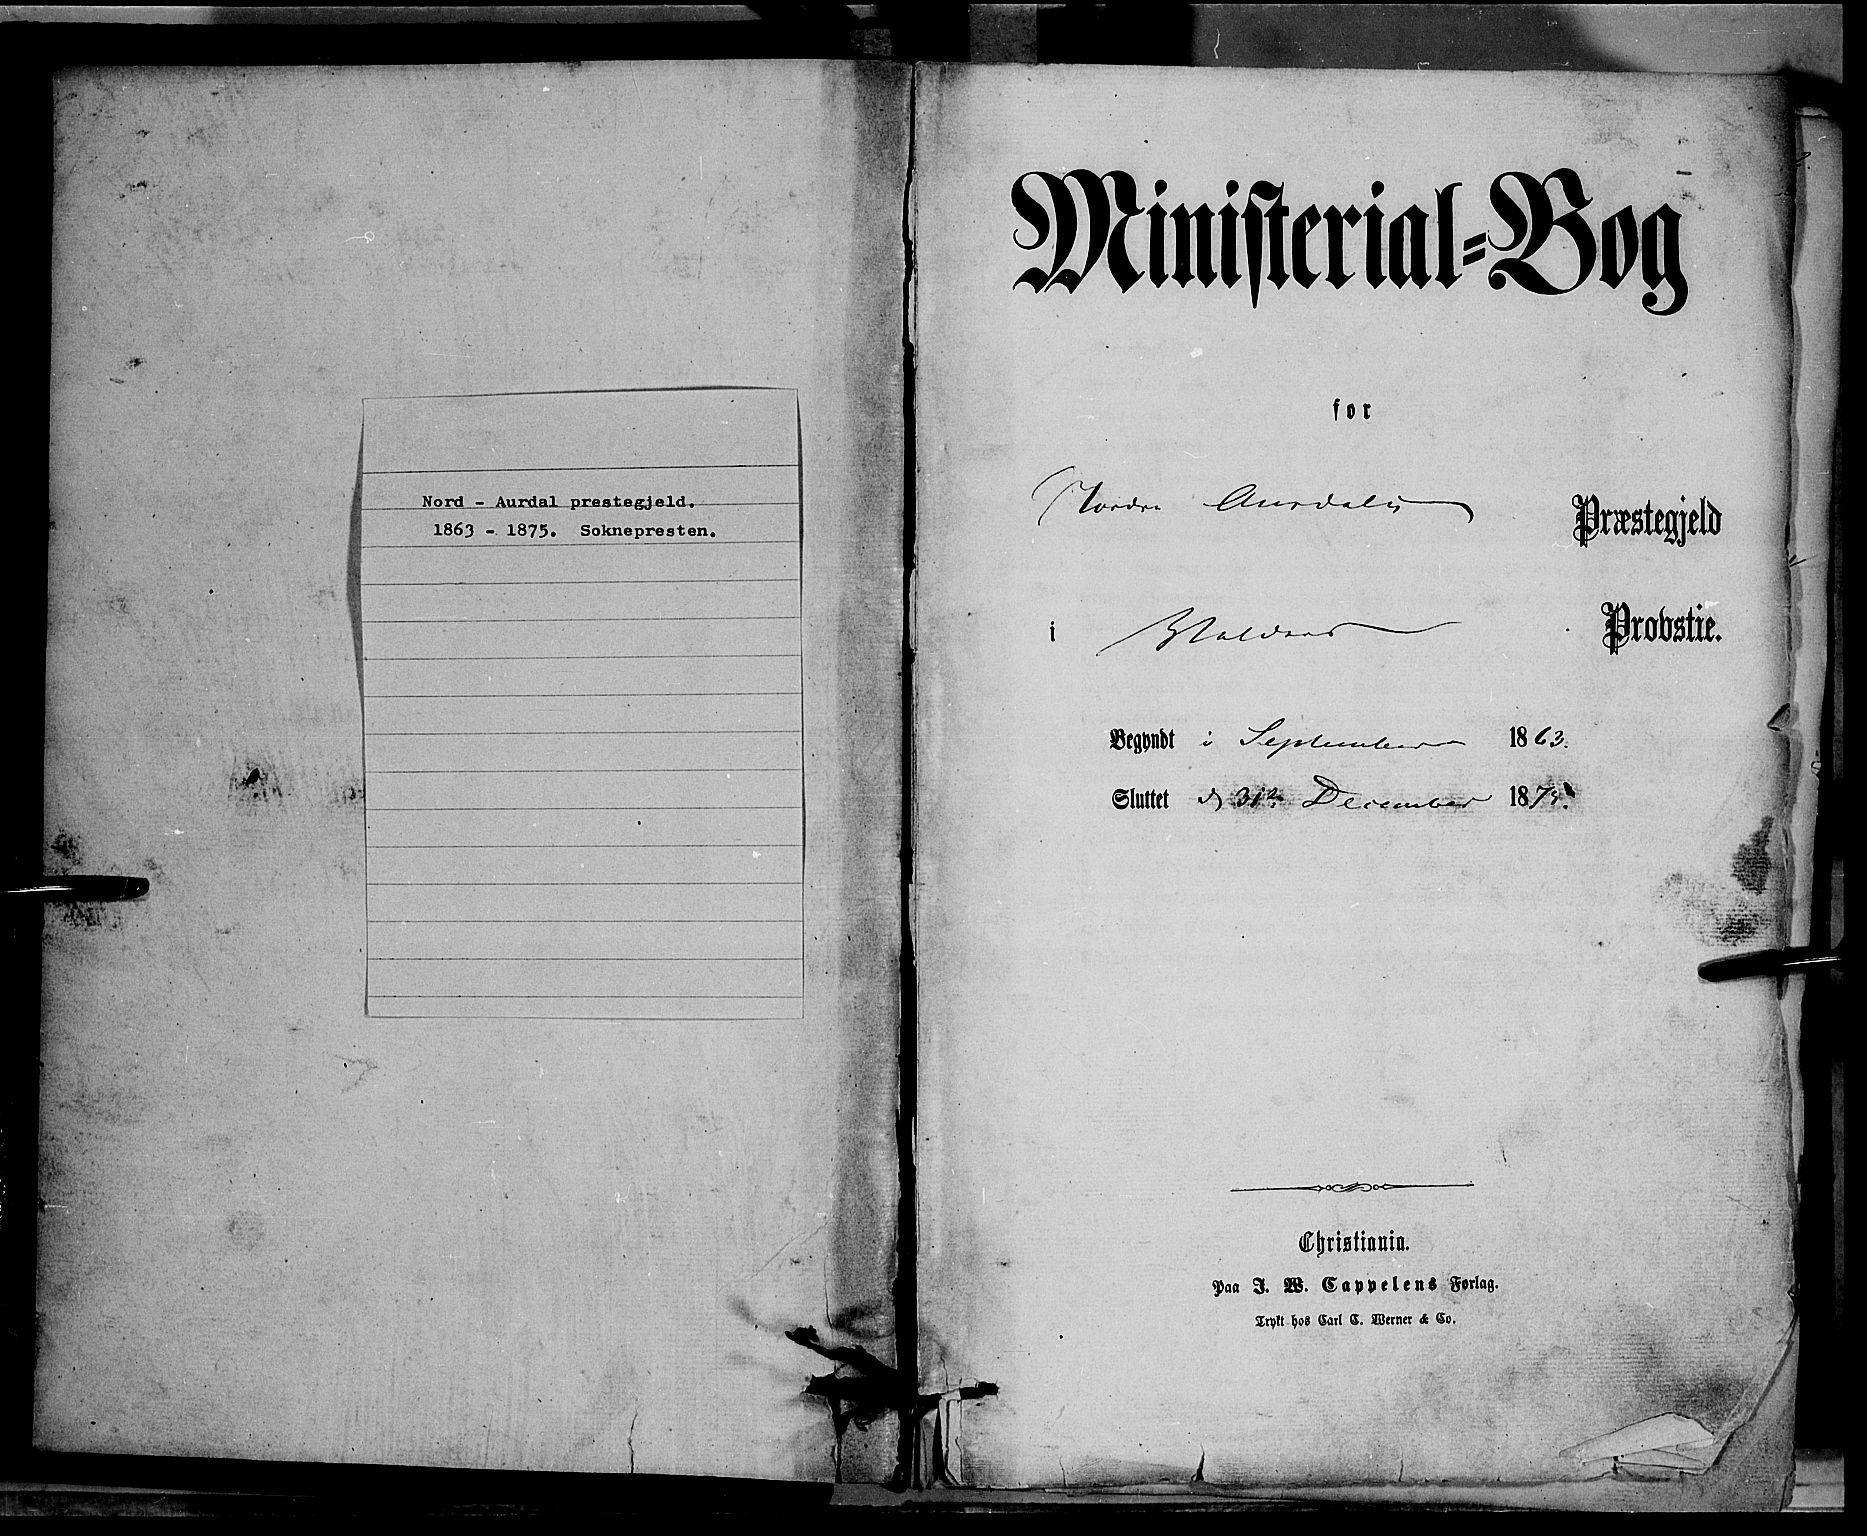 SAH, Nord-Aurdal prestekontor, Ministerialbok nr. 8, 1863-1875